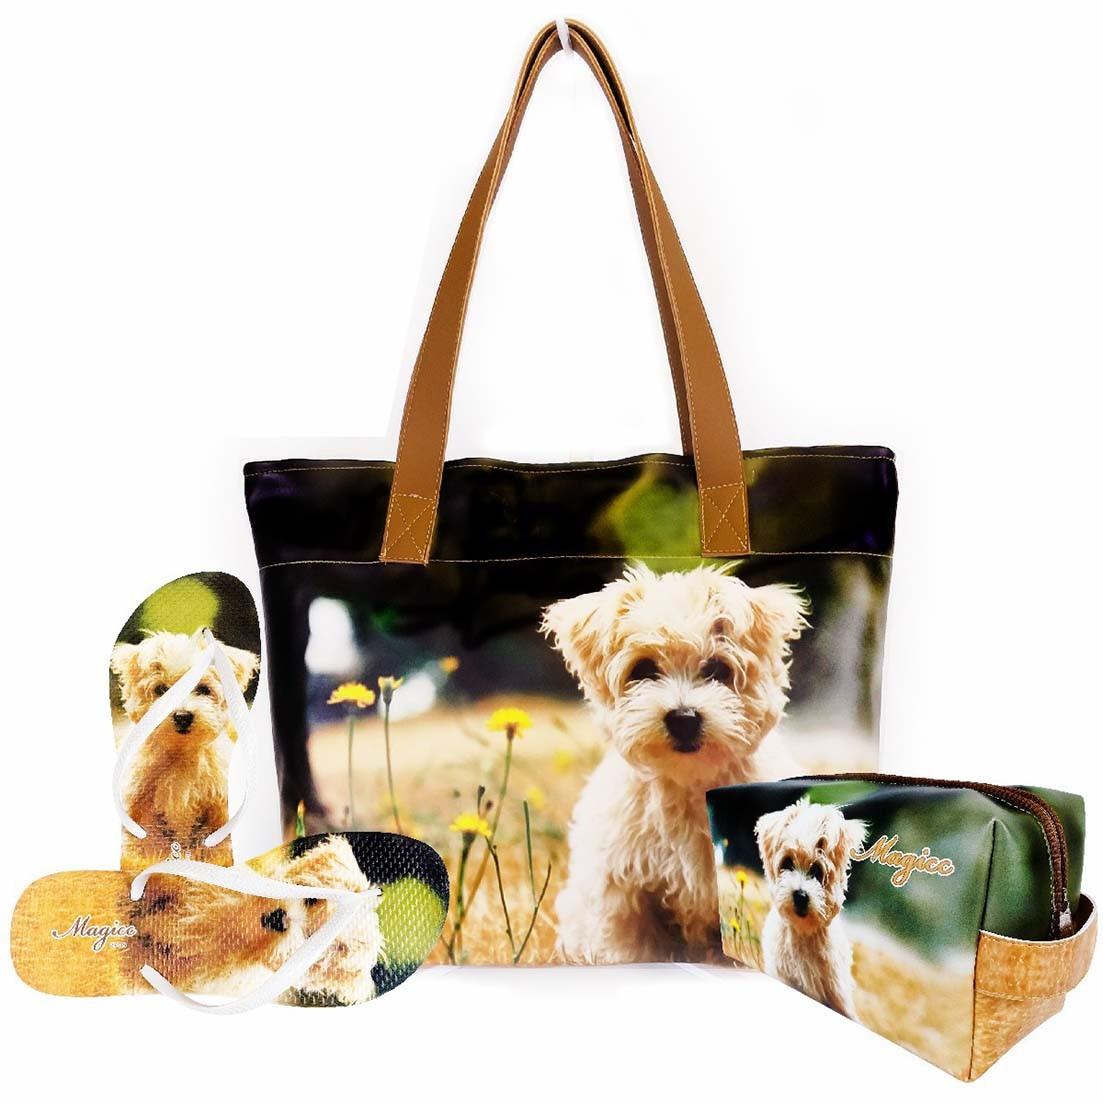 Kit Pet Feminino Cachorro com Bolsa, Necessaire e Chinelo, Magicc